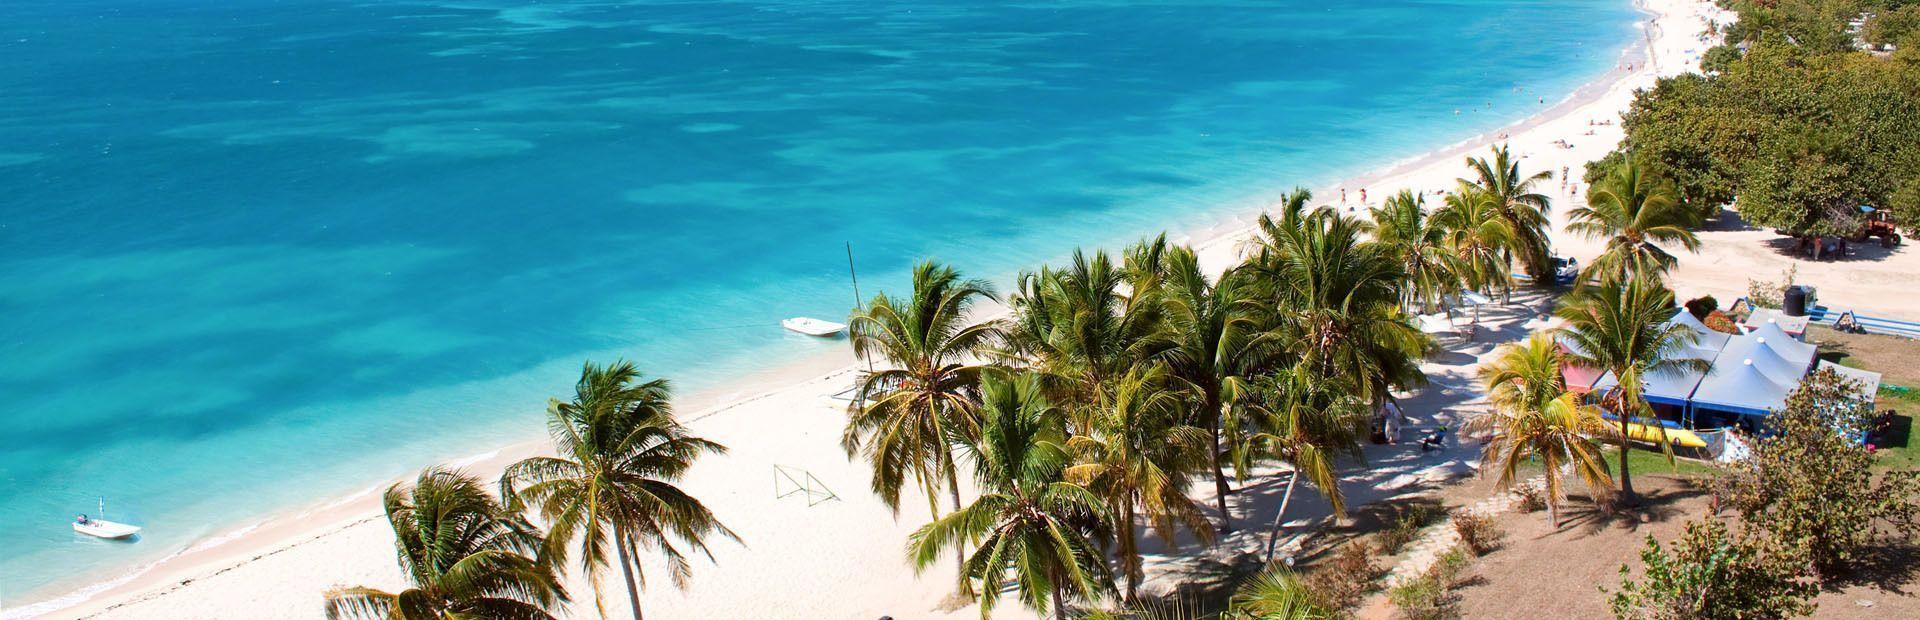 Cuba: beach life